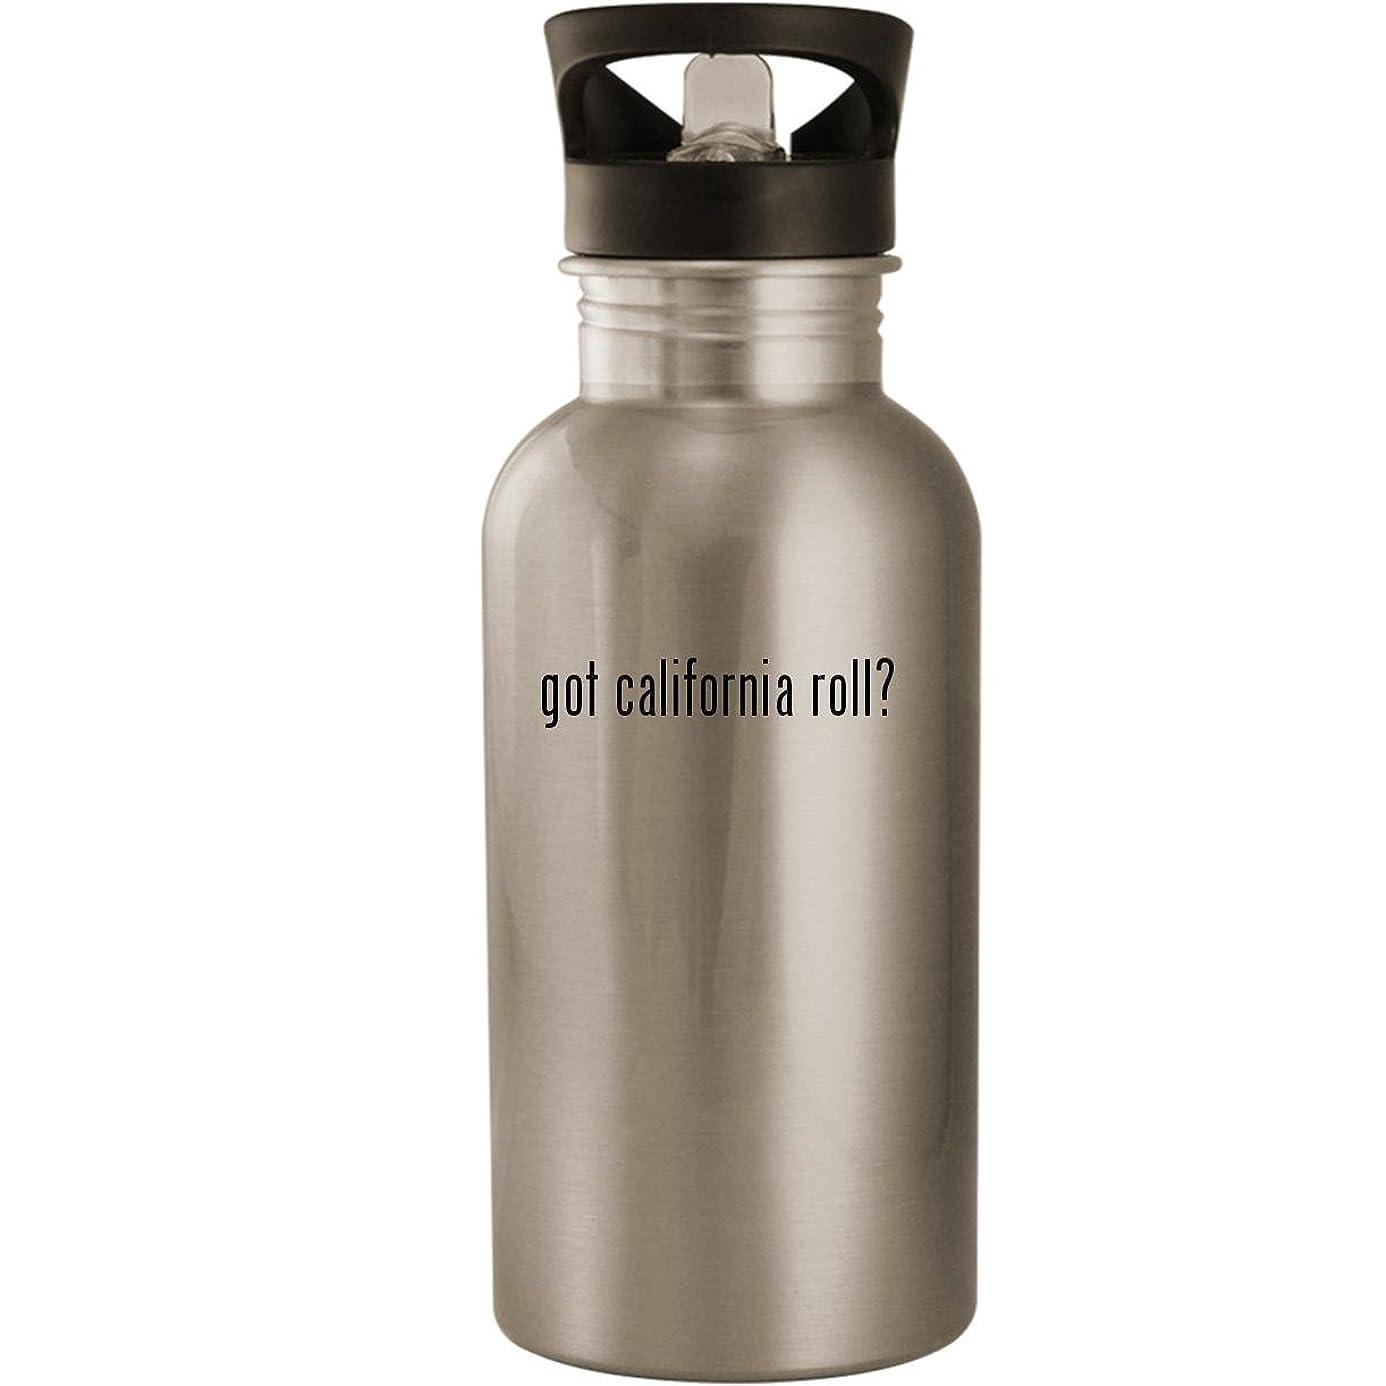 got california roll? - Stainless Steel 20oz Road Ready Water Bottle, Silver